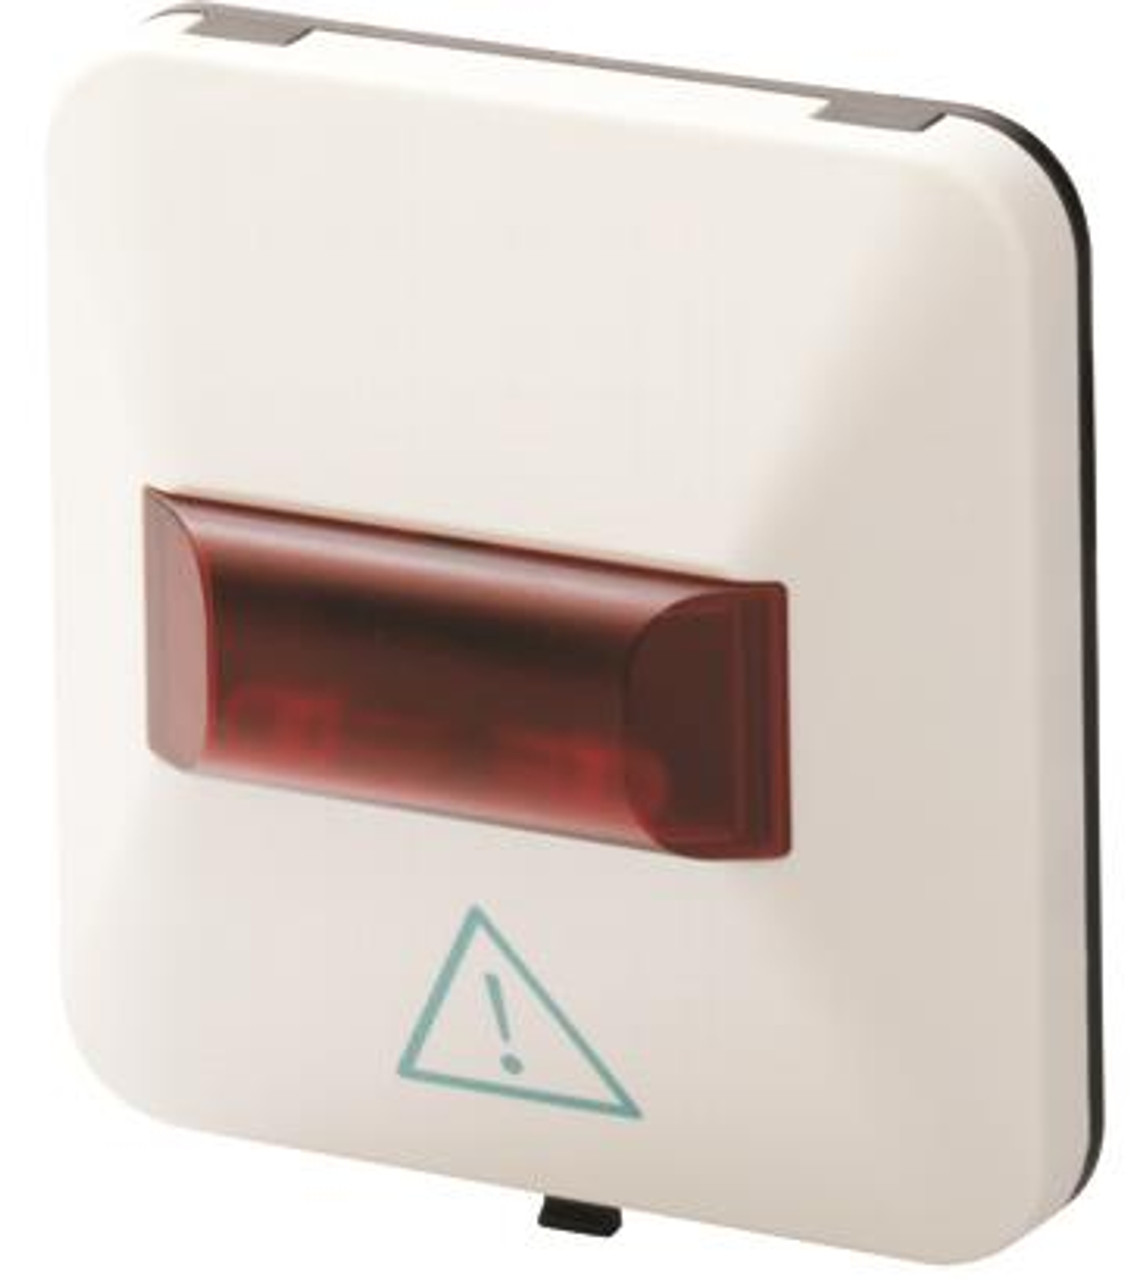 Siemens FDAI92-Ex, S54370-F4-A1 Alarm indicator - Surface for explosion-hazard areas